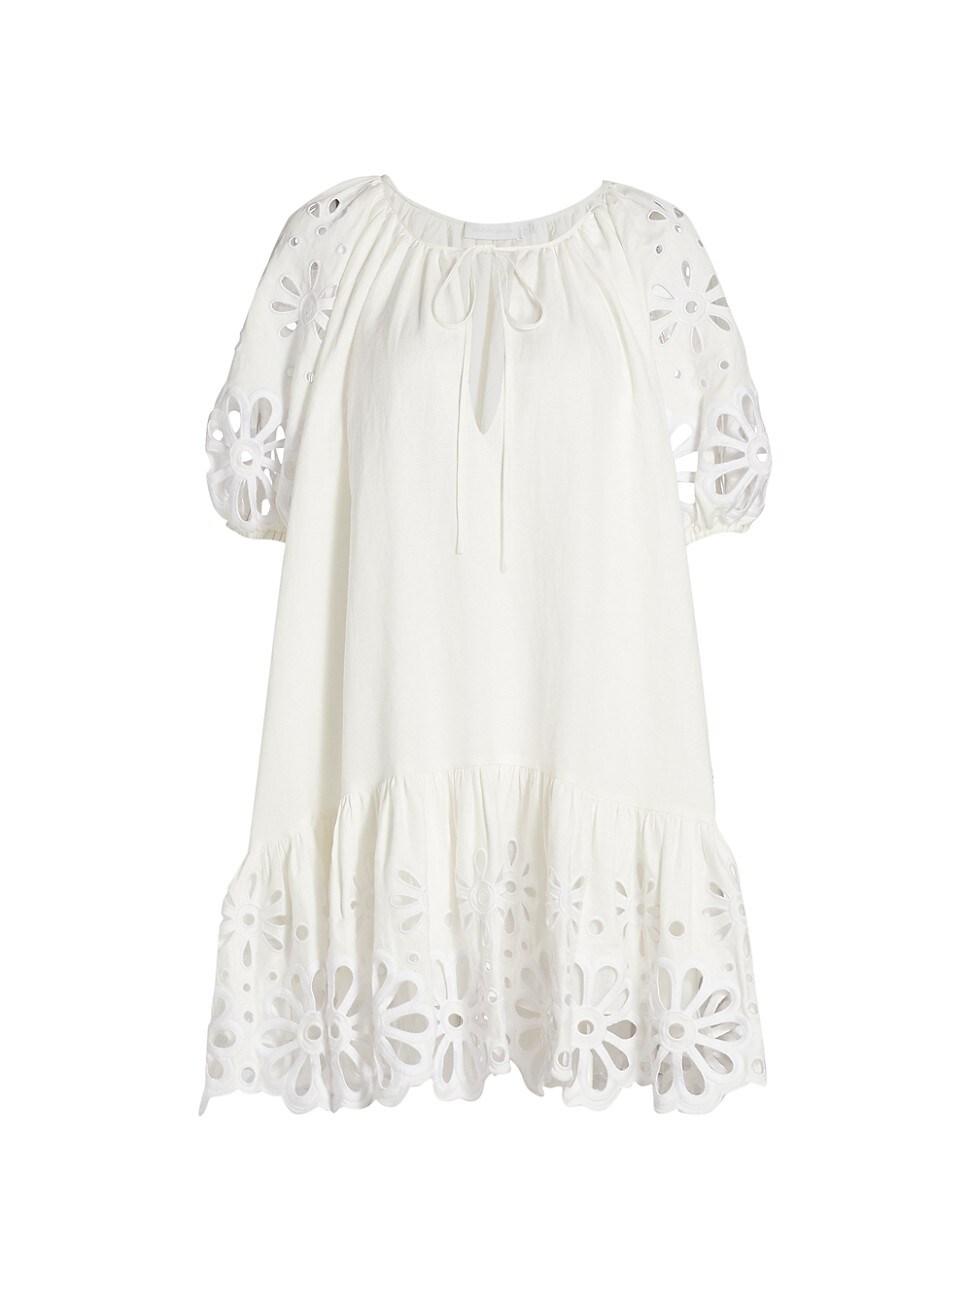 Jonathan Simkhai WOMEN'S EVANGELINA BRODERIE ANGLAISE DRESS